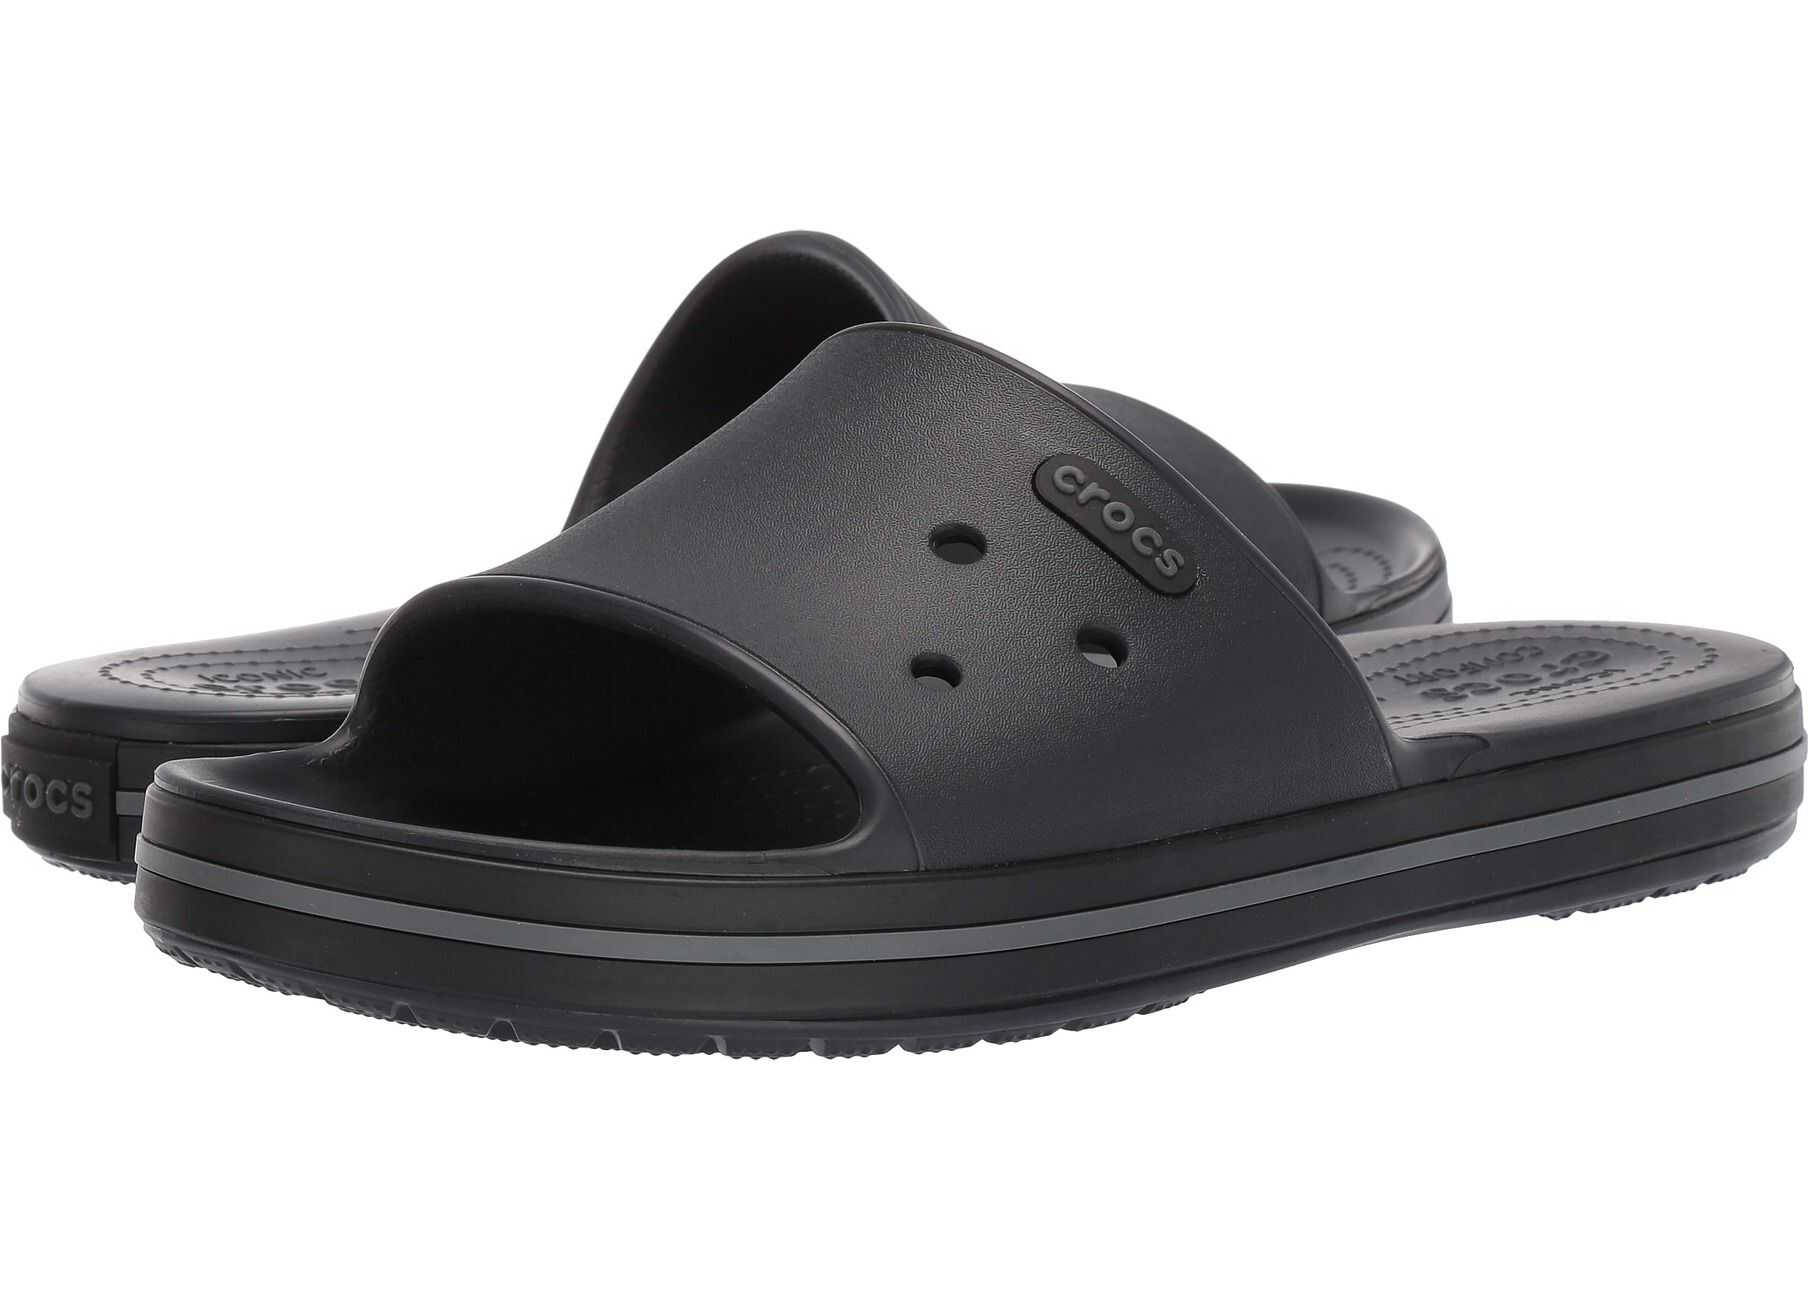 Crocs Crocband III Slide Black/Graphite